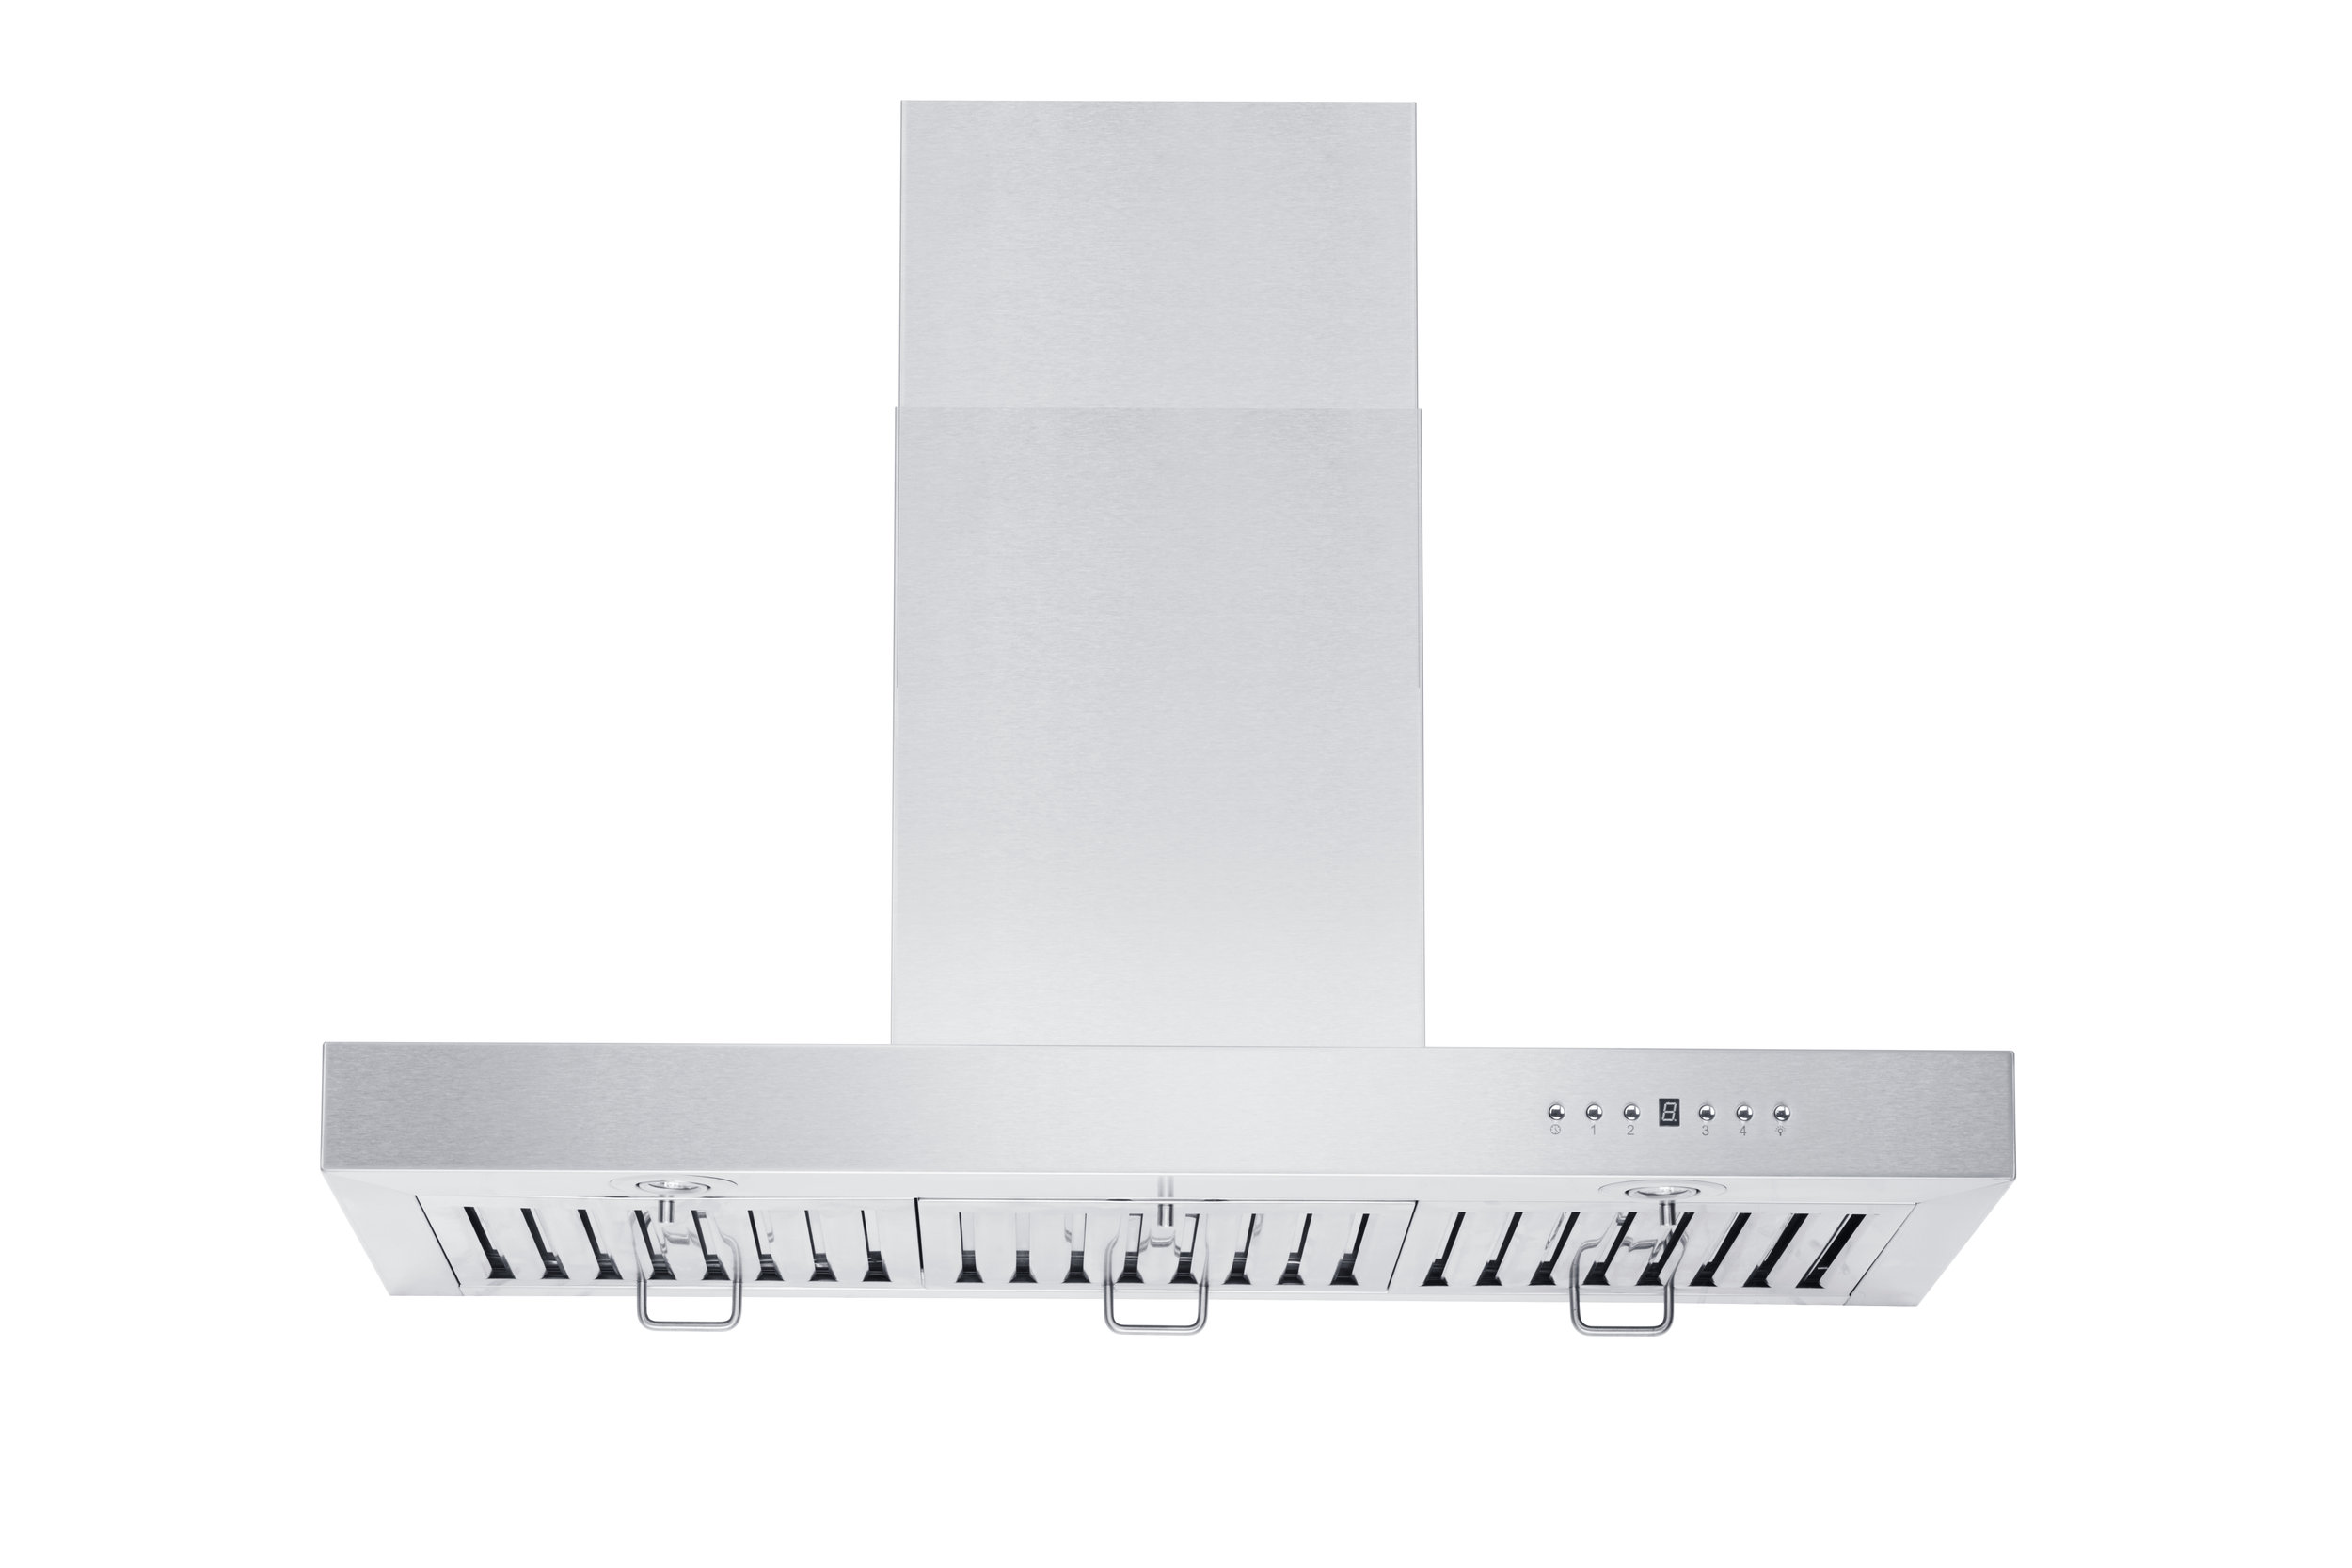 zline-stainless-steel-wall-mounted-range-hood-KE-new-under.jpg